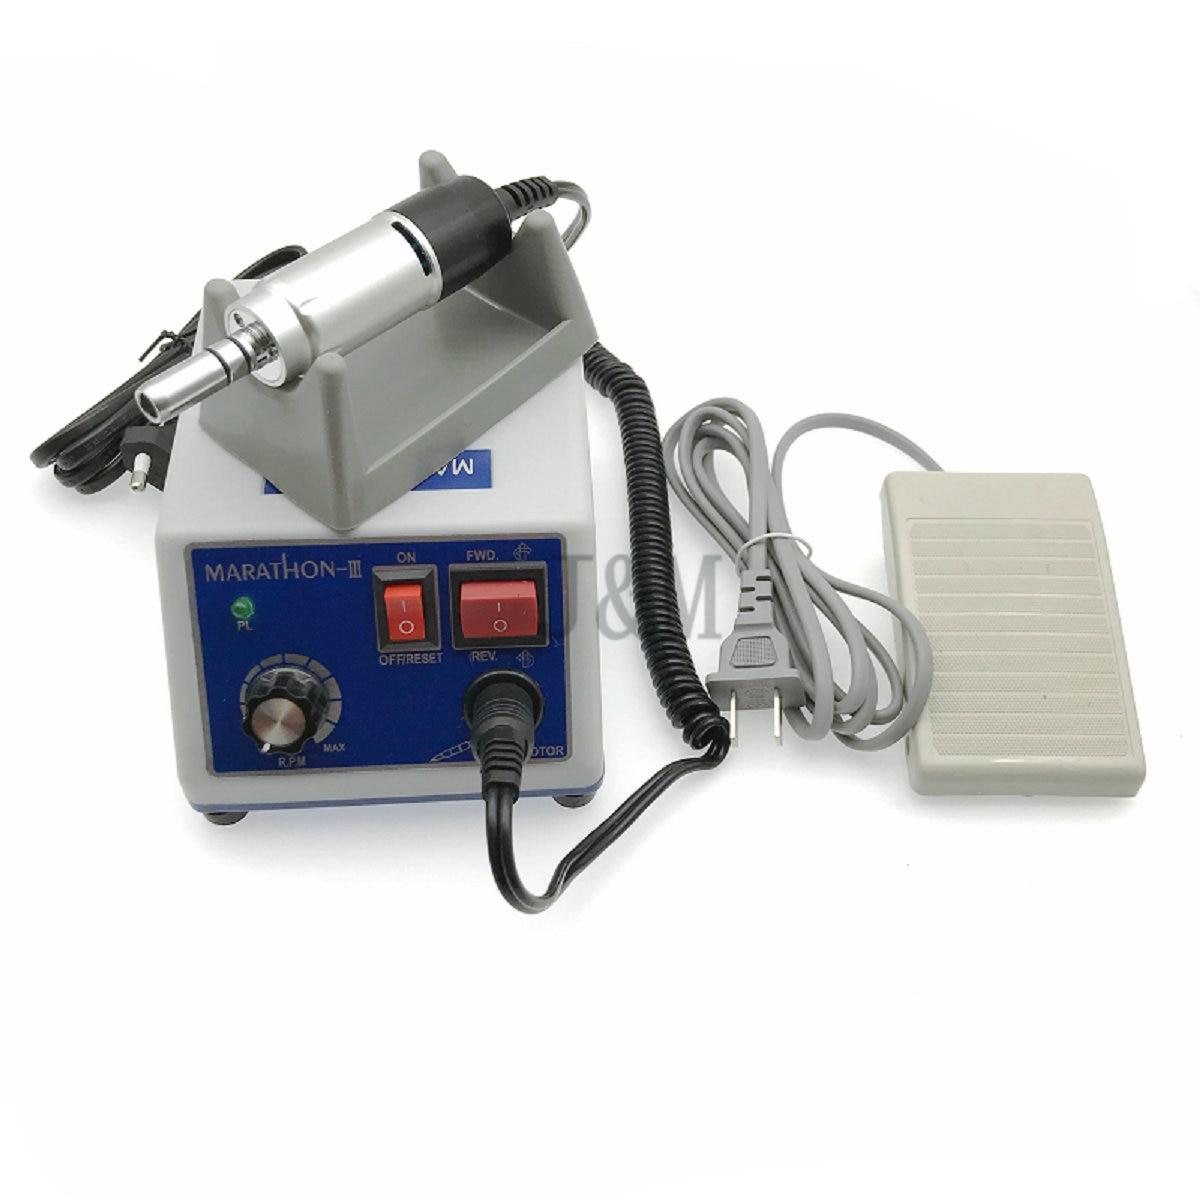 Dental Lab MARATHON Micromotor Machine N3 Electric Micro Motor